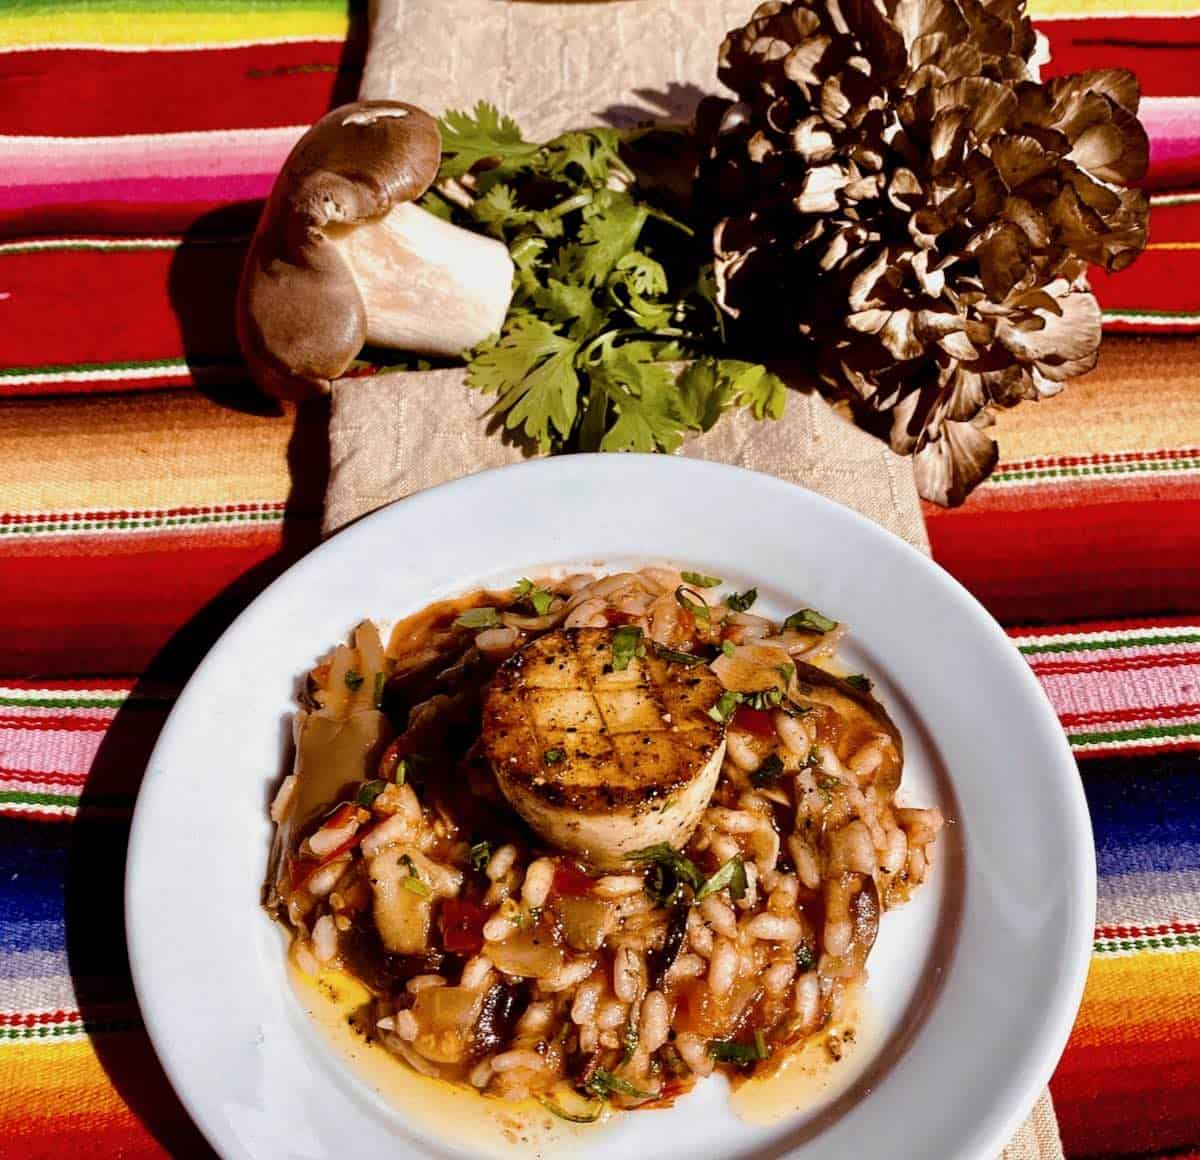 cantina style mushroom risotto